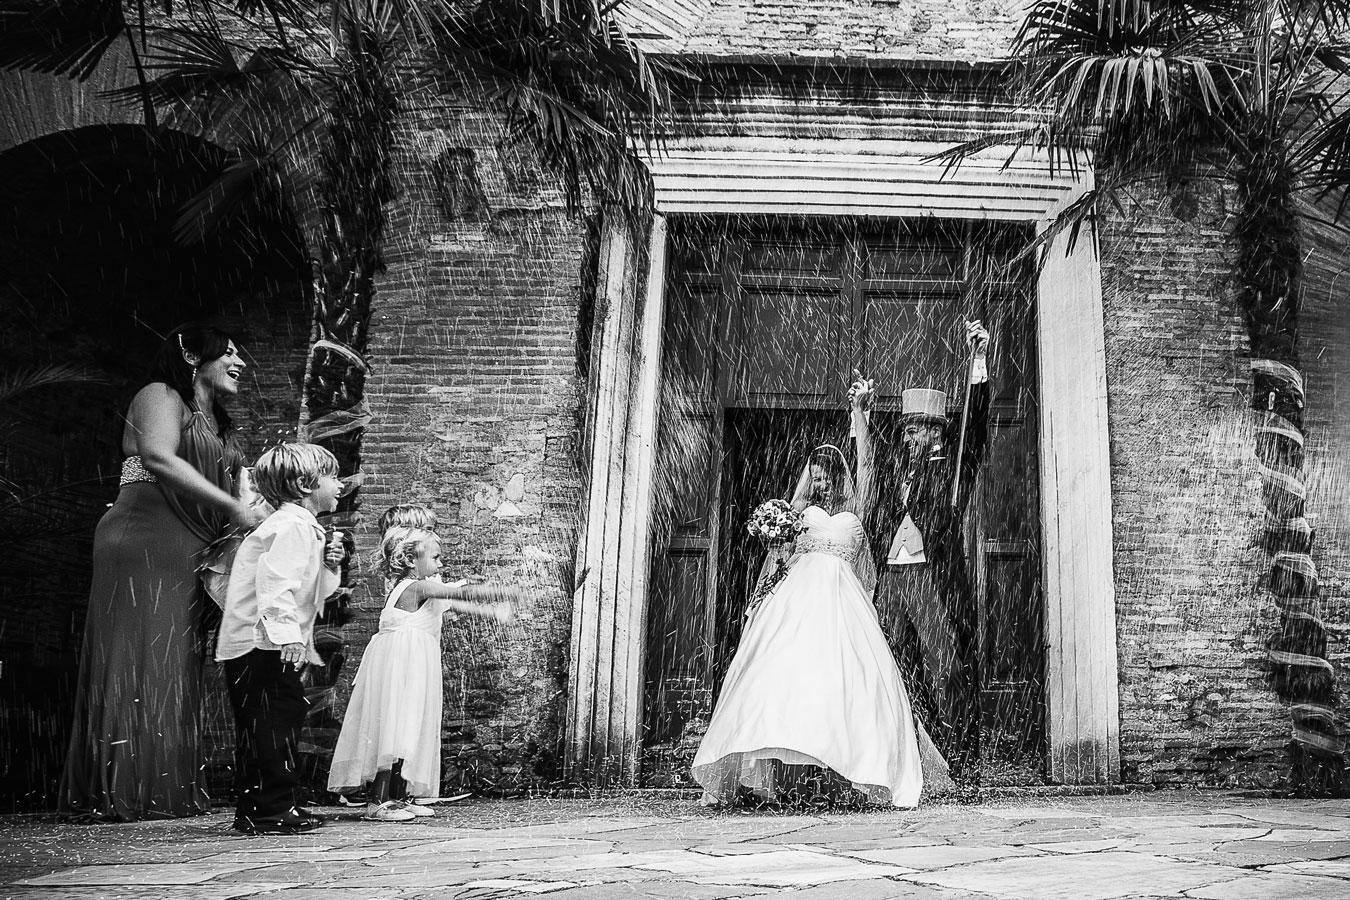 Matrimoni Romani Antichi : Fotografo matrimoni roma servizi fotografici matrimoniali